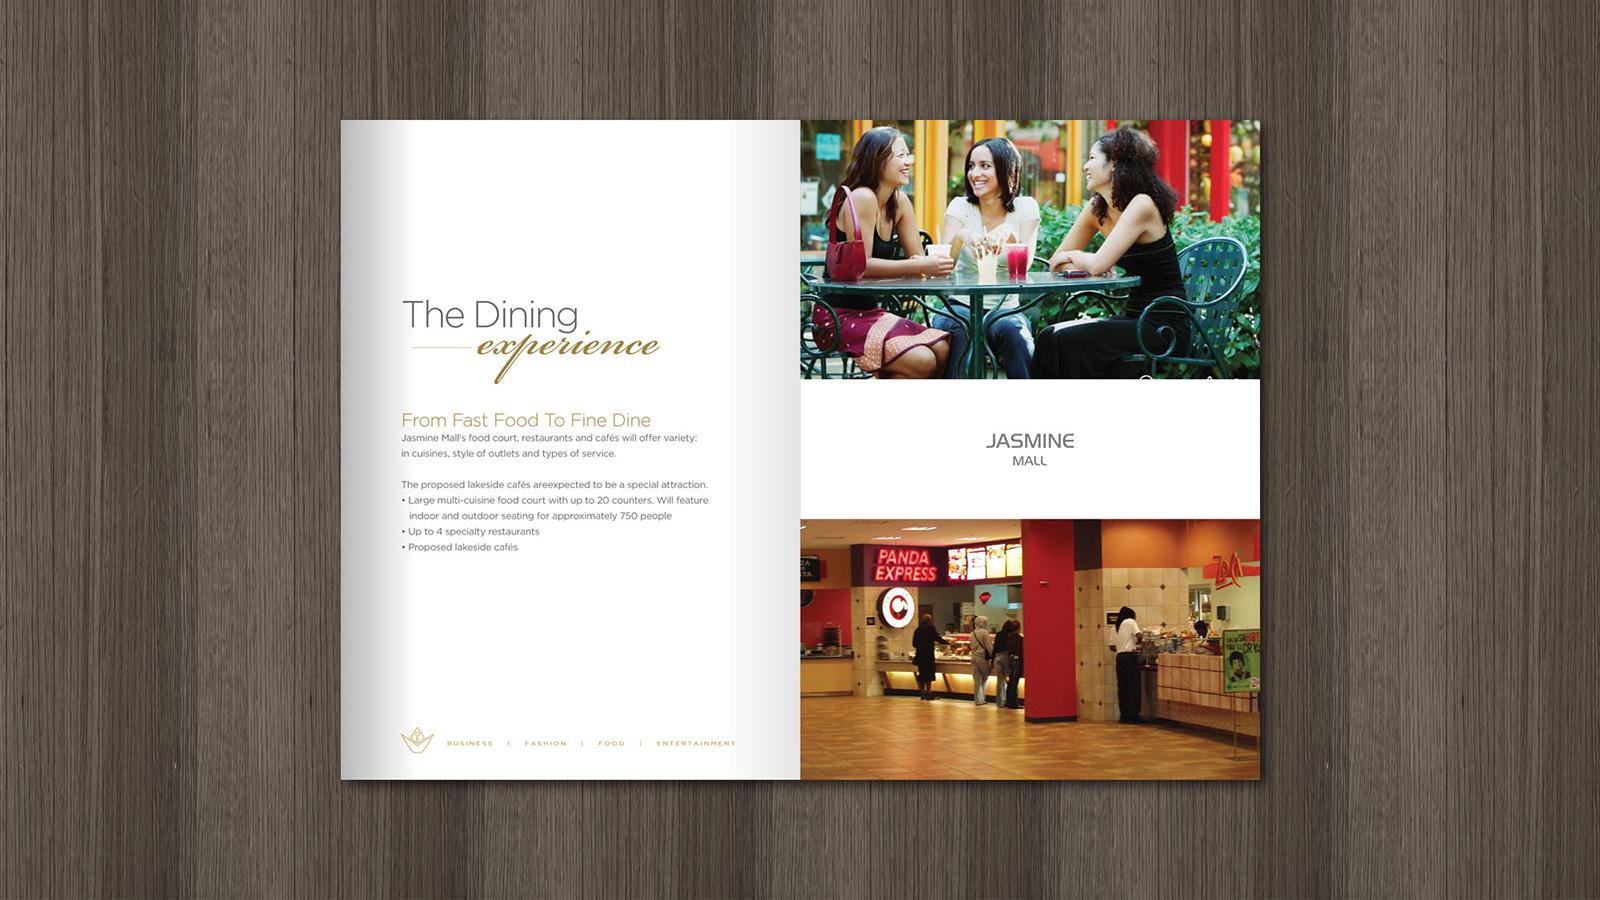 graphic-brand-design-web-designer-hiline-lahore-pakistan-jasmine-mall-011